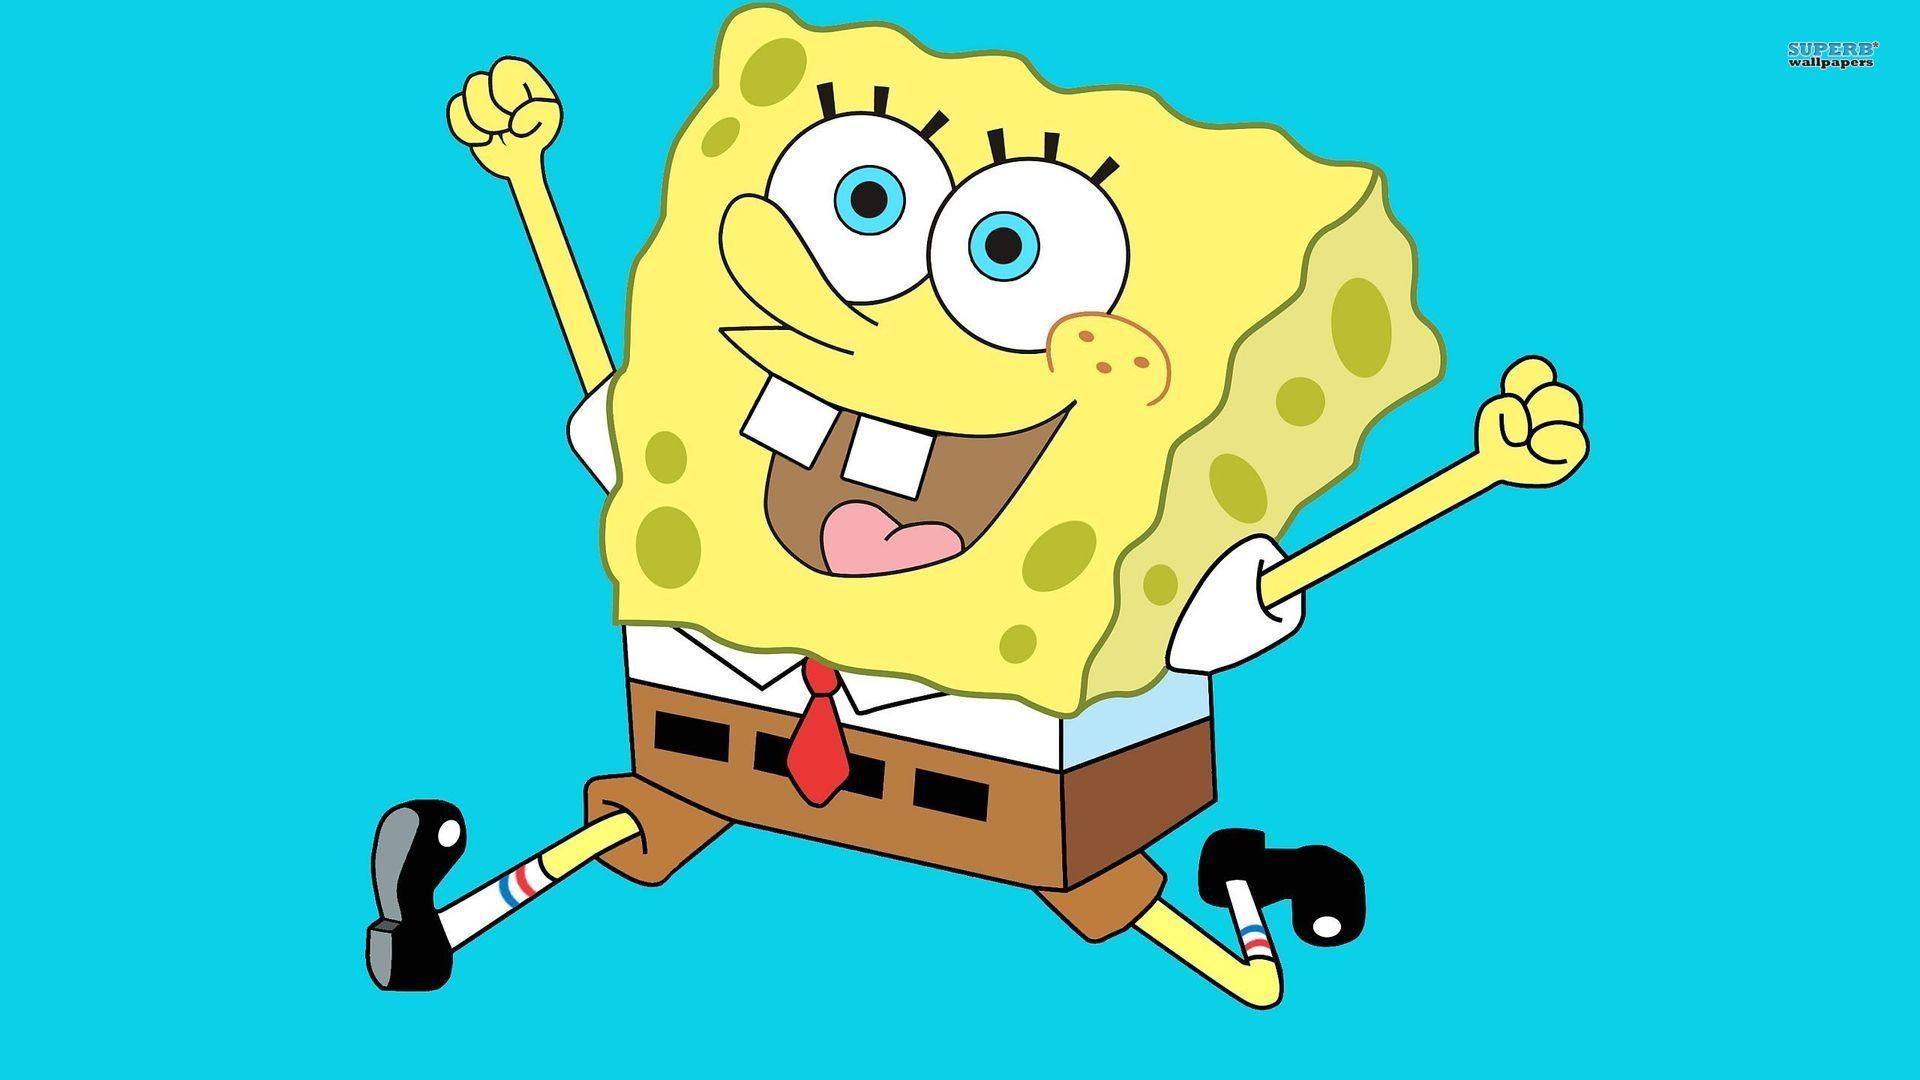 Spongebob-Wallpaper-Picture-HD.jpg